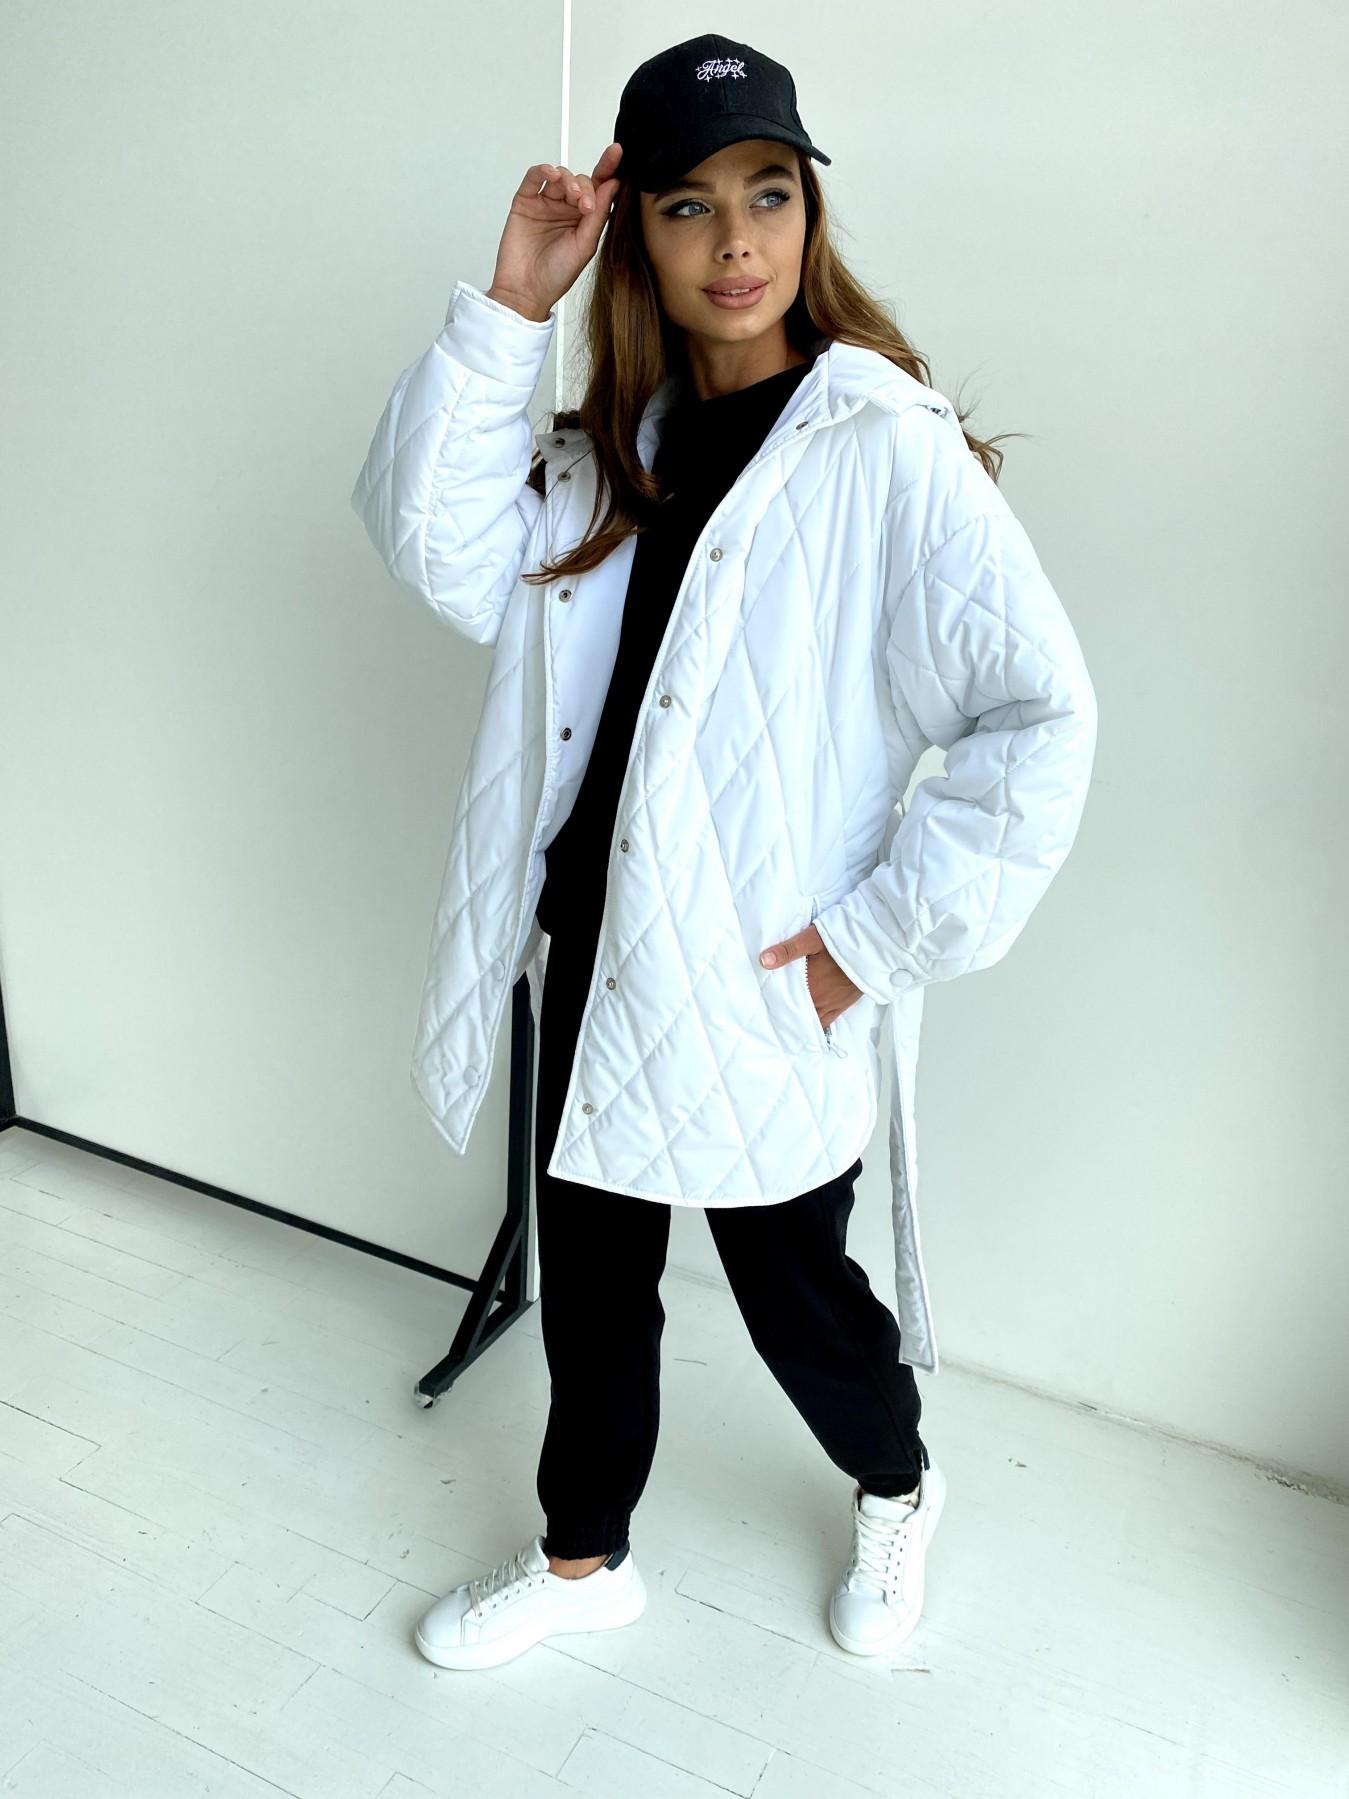 Пазл стеганая куртка из плащевки 11764 АРТ. 48509 Цвет: Молоко 12 - фото 6, интернет магазин tm-modus.ru